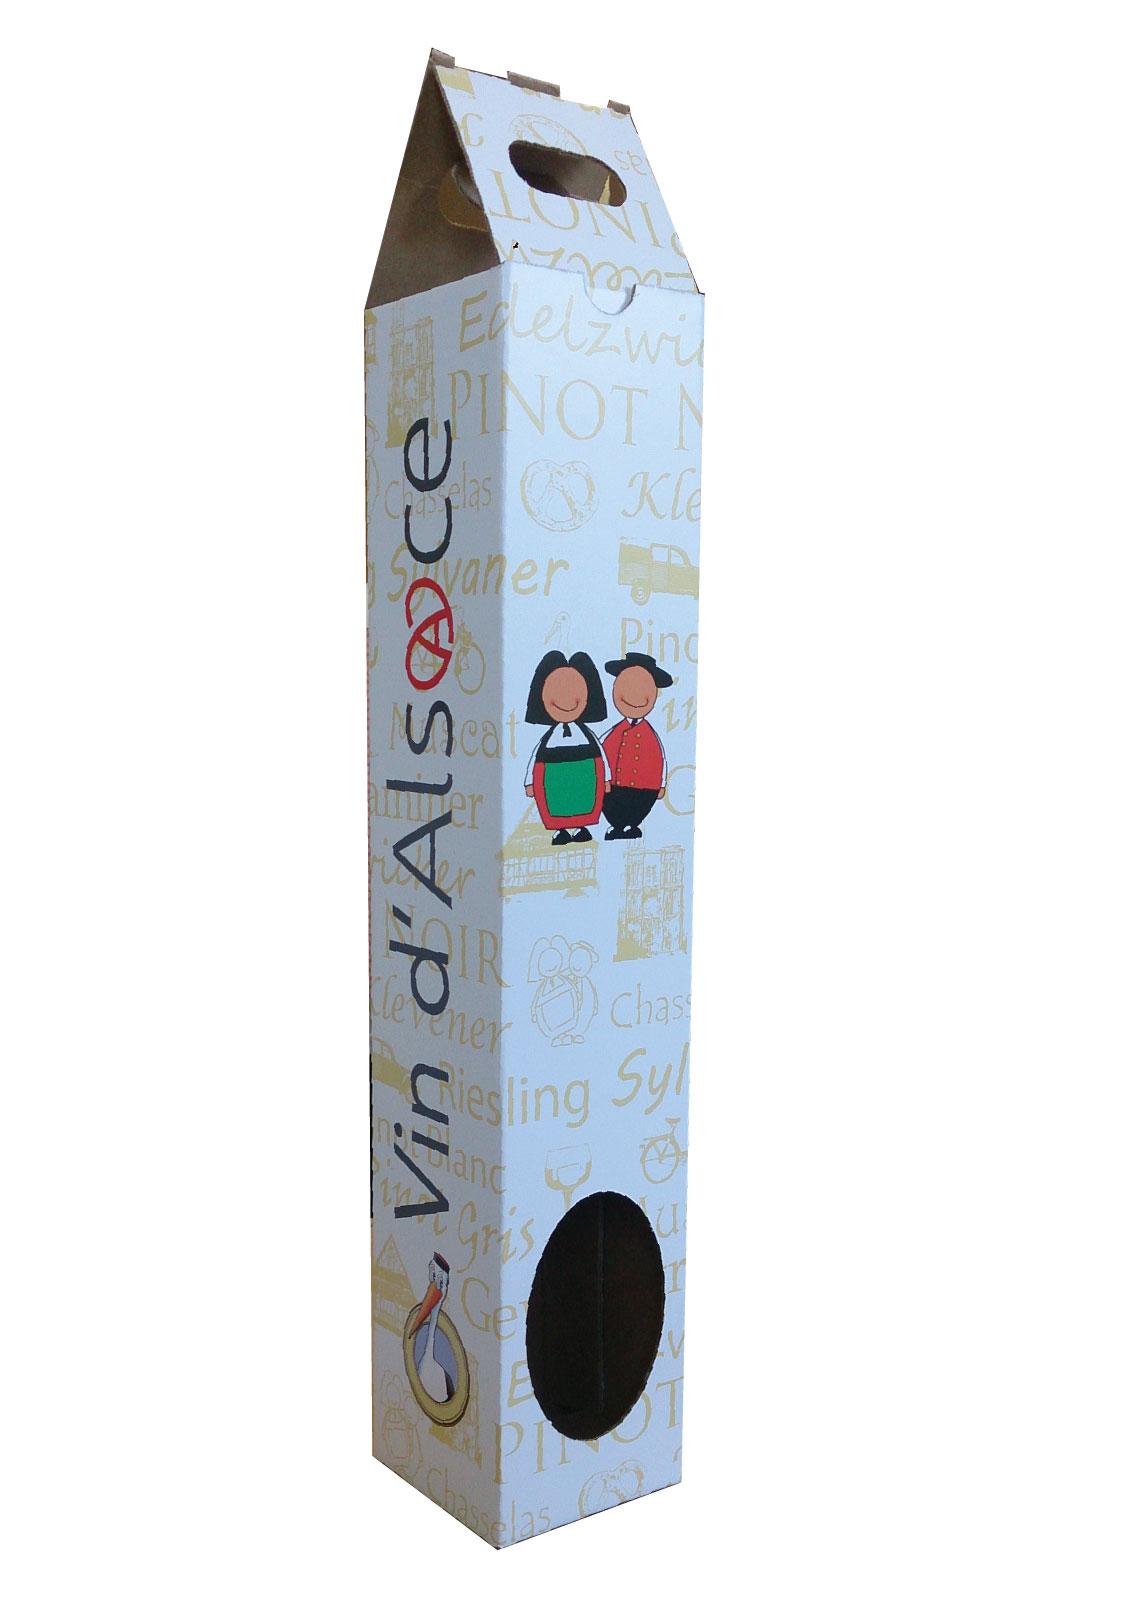 nouvelle gamme d 39 emballage jeannala seppala de smurfit kappa cartonnage de colmar. Black Bedroom Furniture Sets. Home Design Ideas